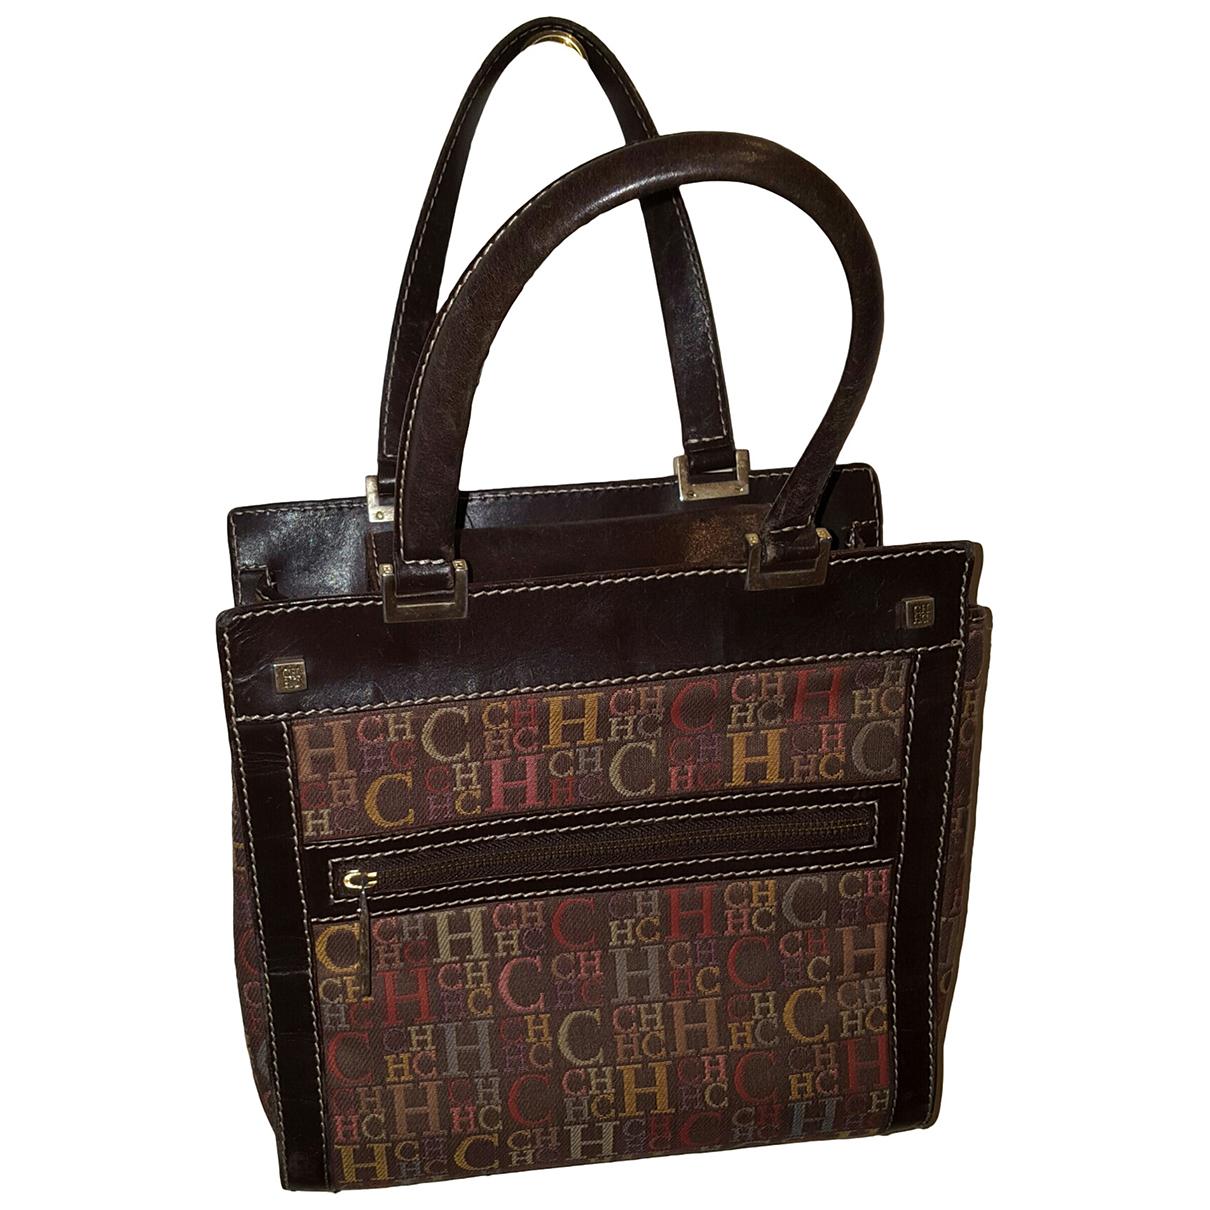 Carolina Herrera N Brown Leather handbag for Women N